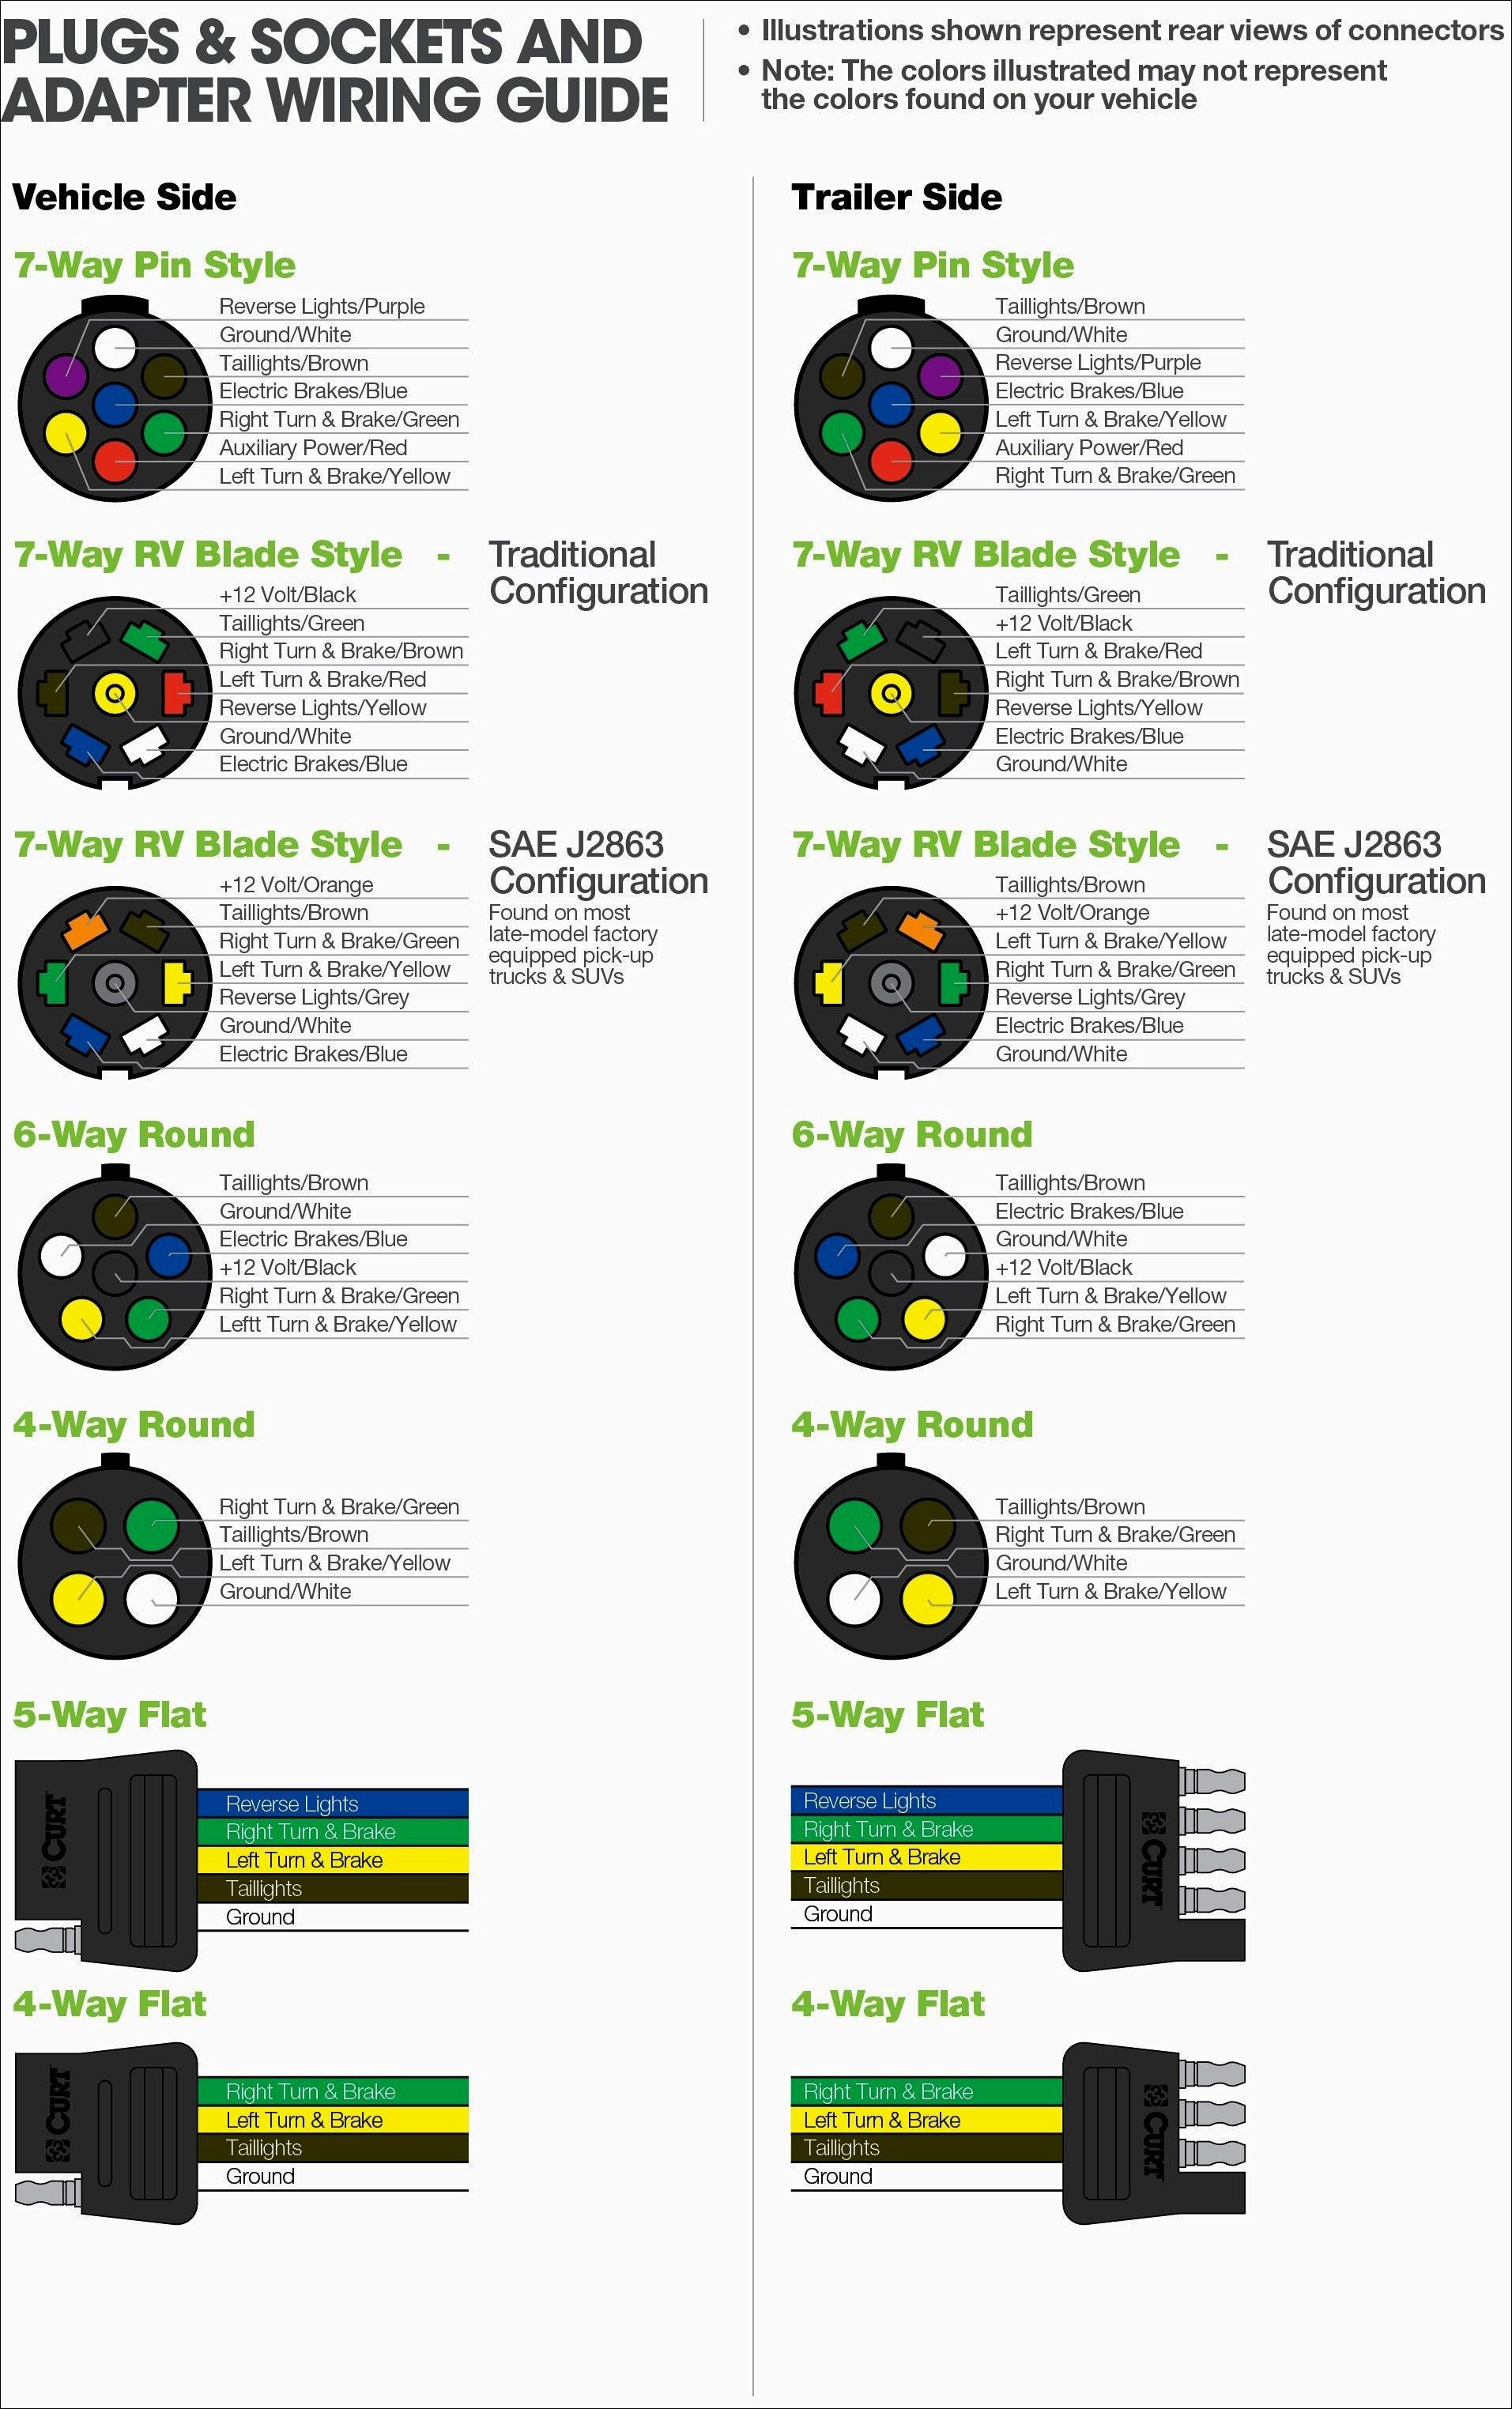 6 pin to 7 pin trailer wiring harness cs 4551  pin trailer wiring diagram on 6 way trailer wiring  cs 4551  pin trailer wiring diagram on